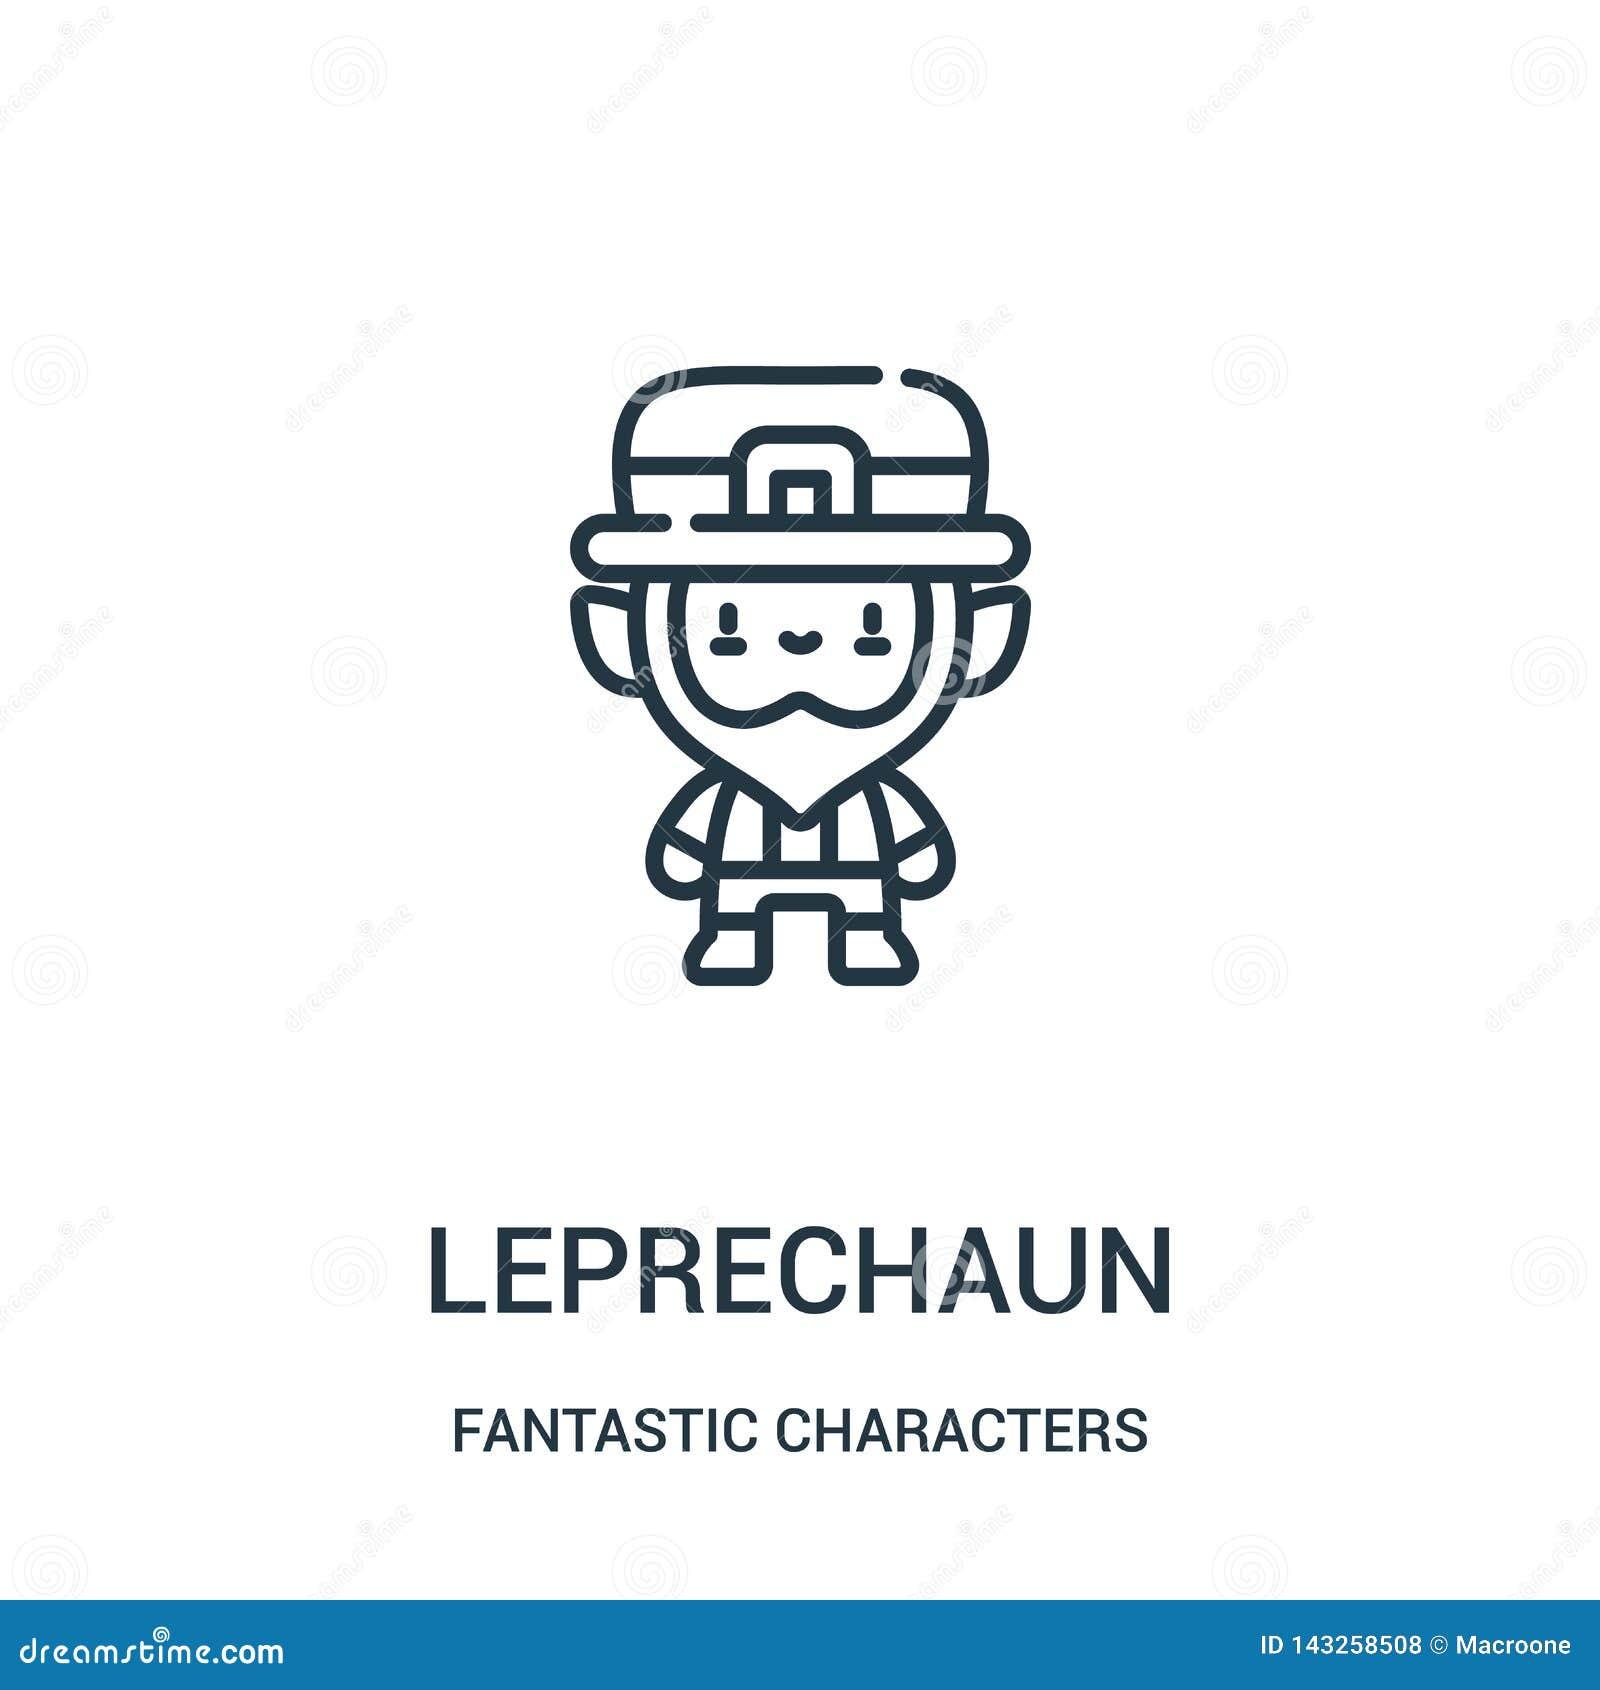 Leprechaun διάνυσμα εικονιδίων από τη φανταστική συλλογή χαρακτήρων Η λεπτή γραμμή leprechaun περιγράφει τη διανυσματική απεικόνι